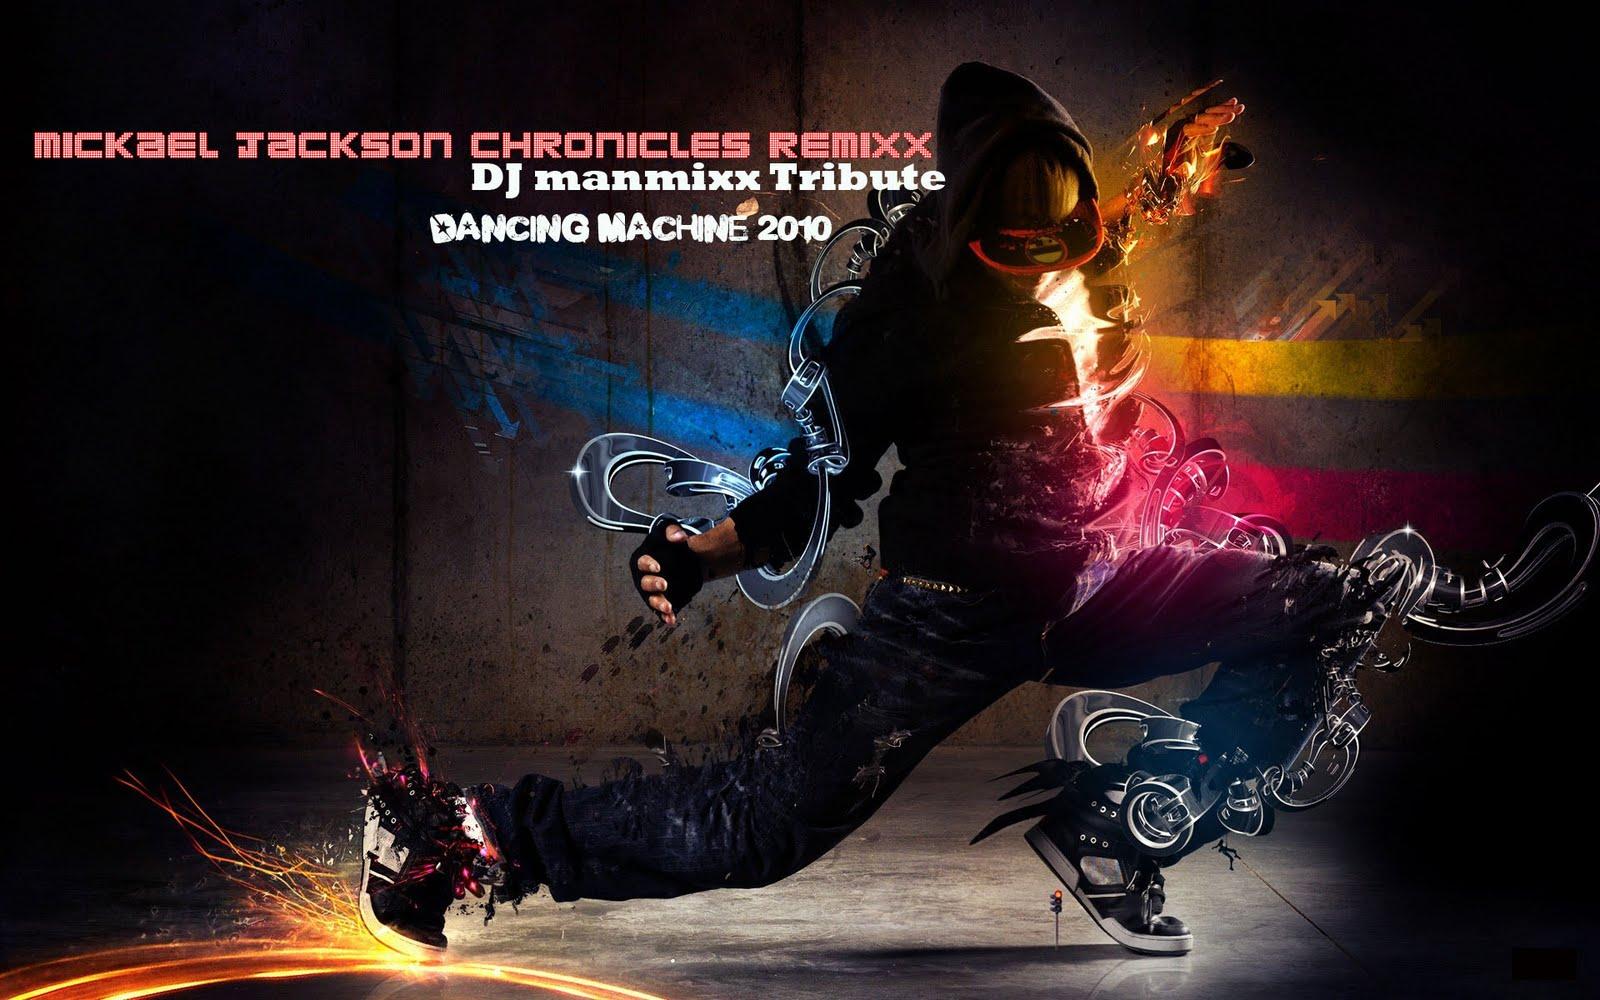 http://4.bp.blogspot.com/_rCWWt8x8hVU/SxGRpO1E_oI/AAAAAAAAAaM/kv1nvtak11k/s1600/Mickael+Jackson+Chronicles+Dj+Manmixx+Remixx+2010.jpg